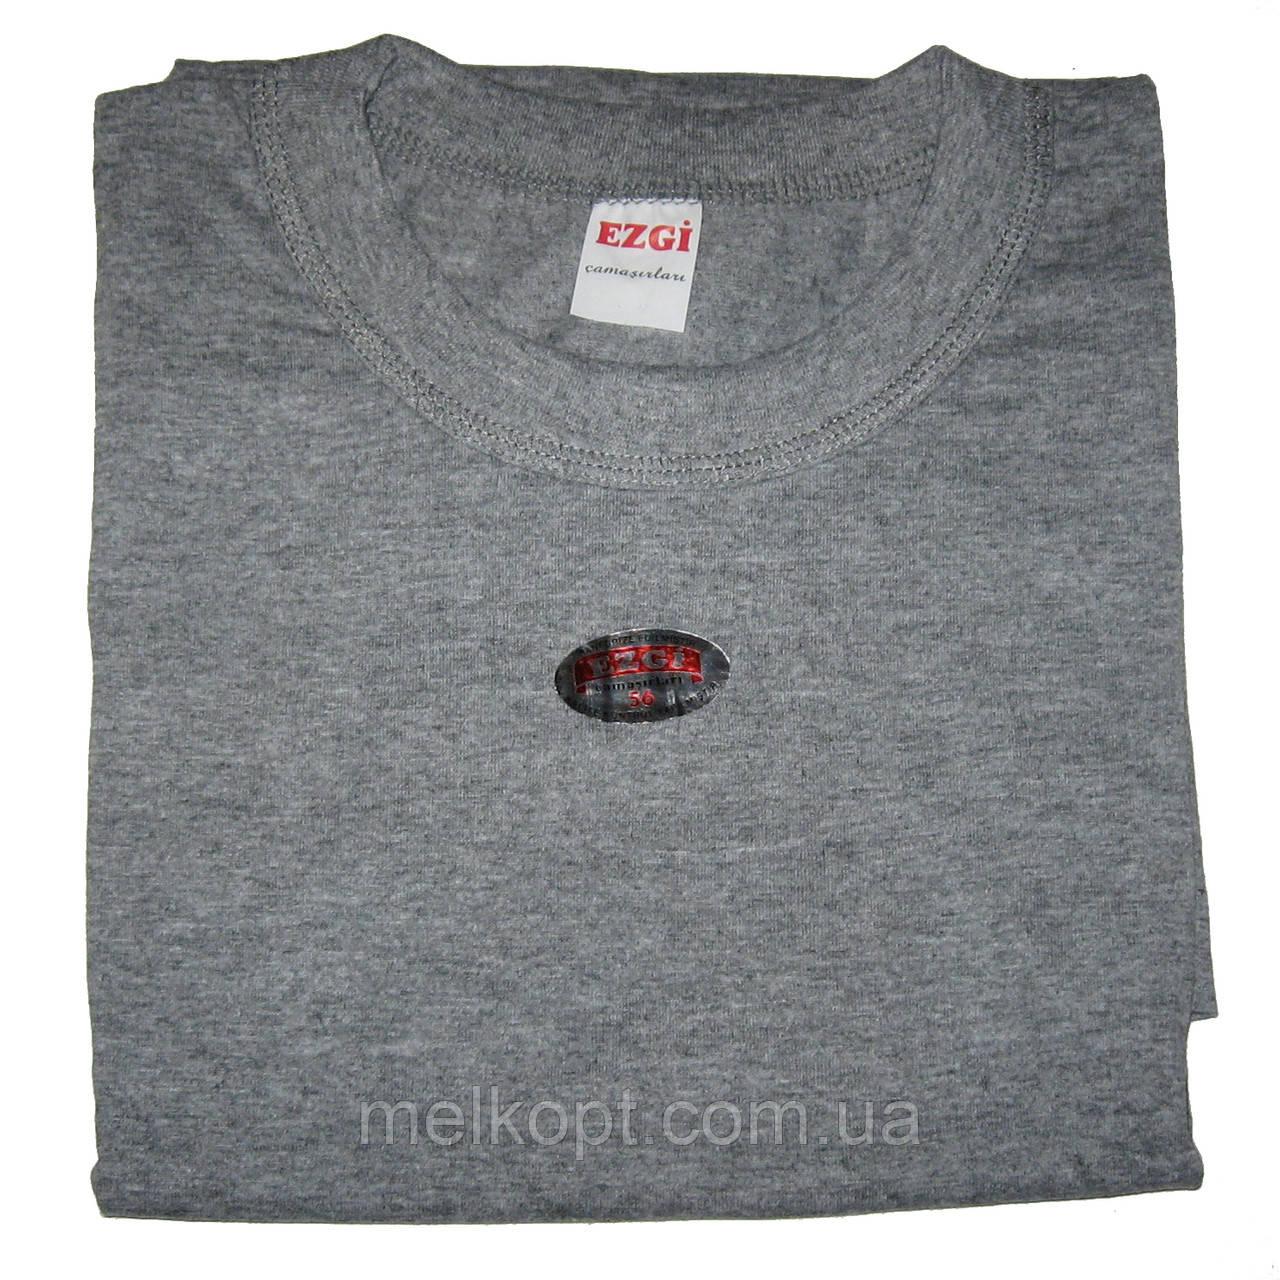 Мужские футболки Ezgi - 48,00 грн./шт. (54-й размер, серые)